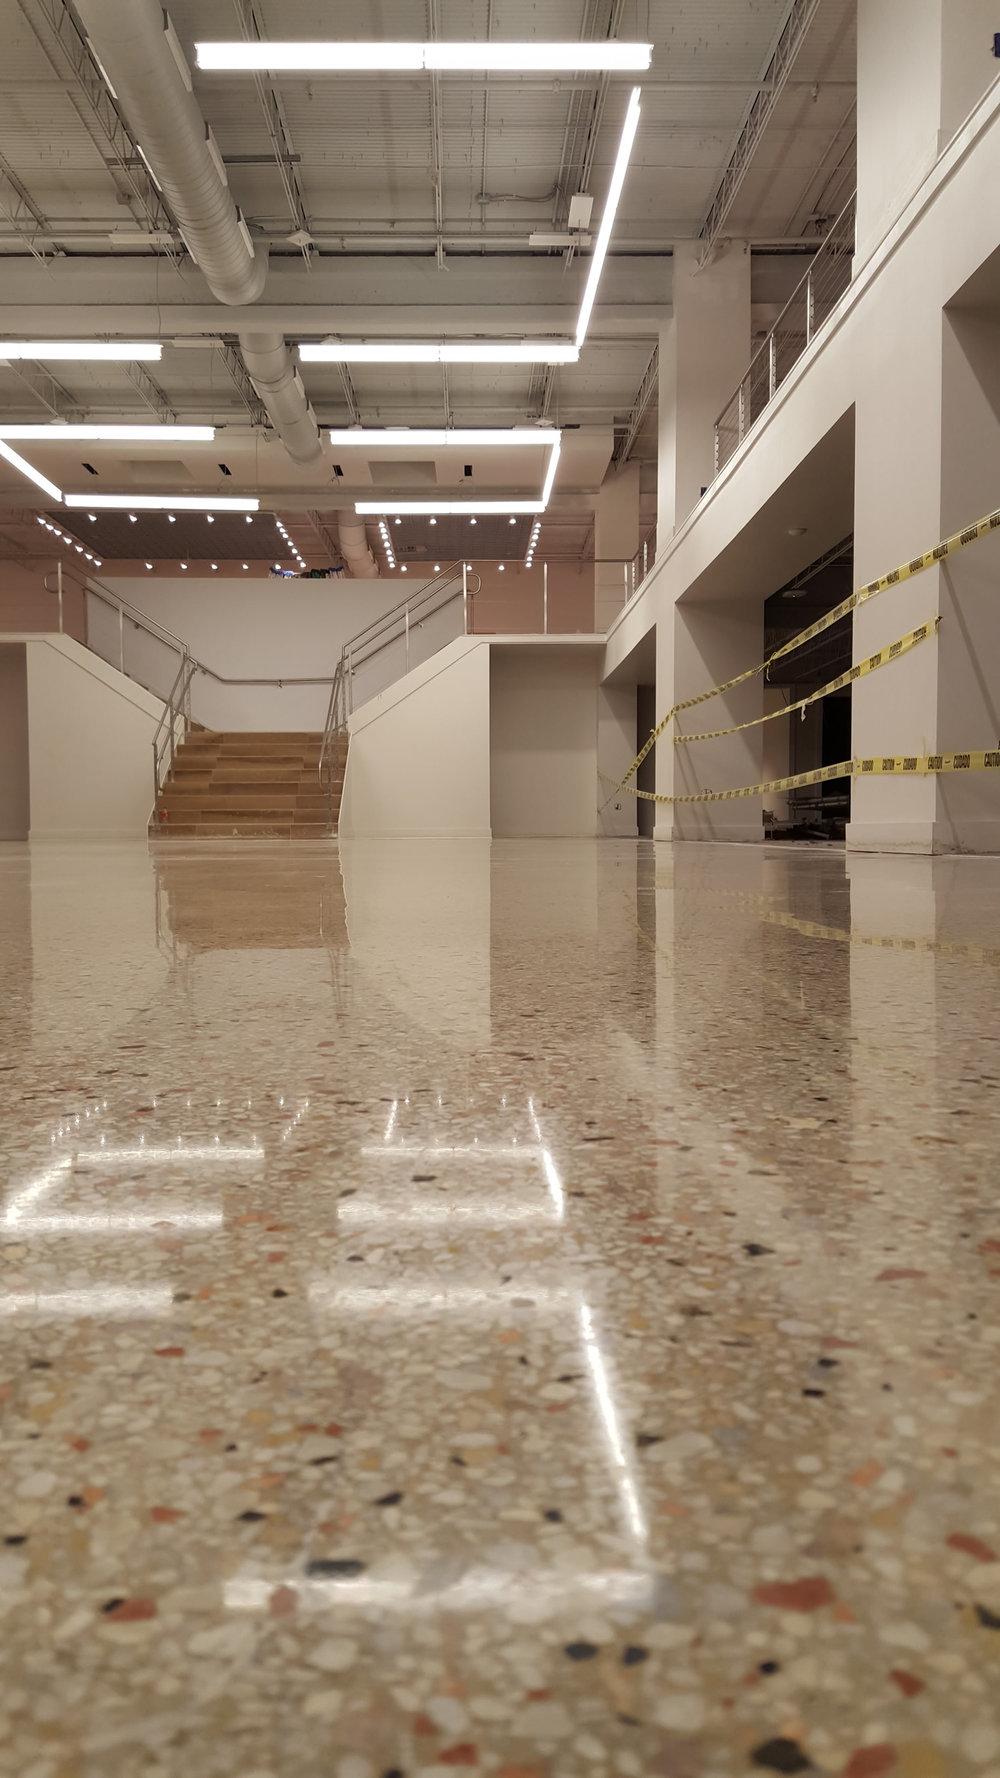 Haverty_s Furniture Store - Terrazzo Restoration - 12.jpg